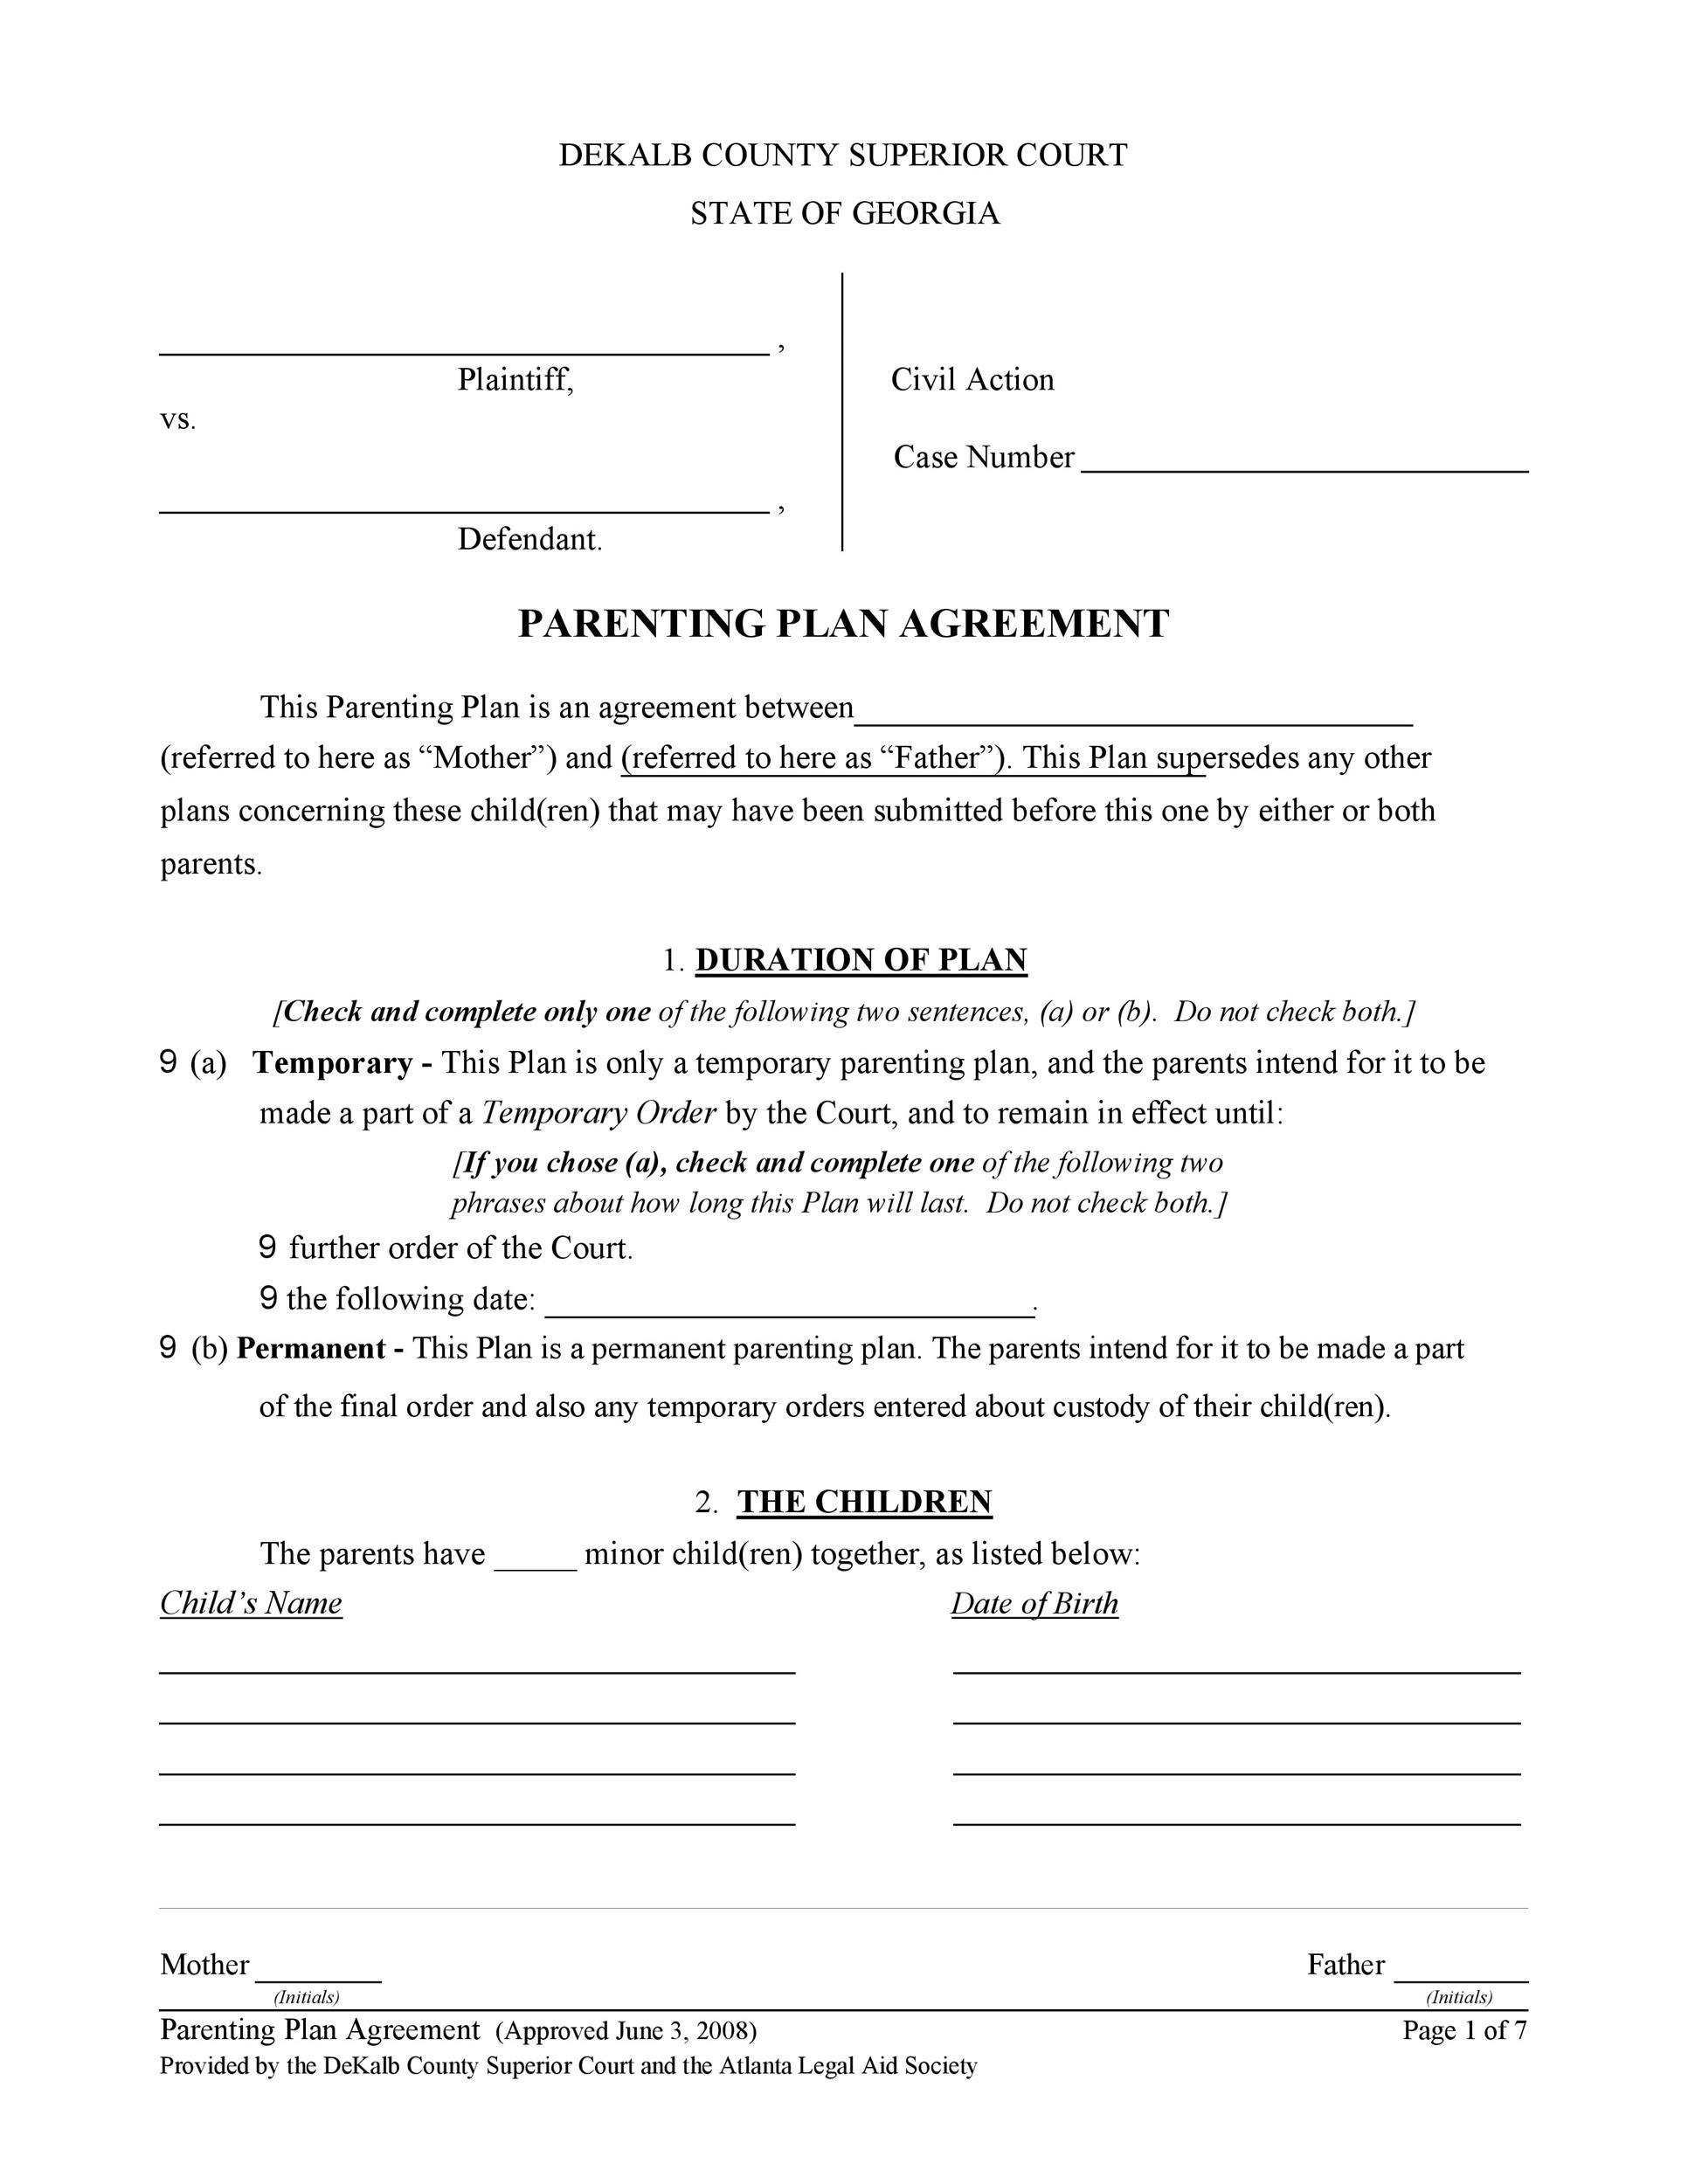 Free parenting plan template 35